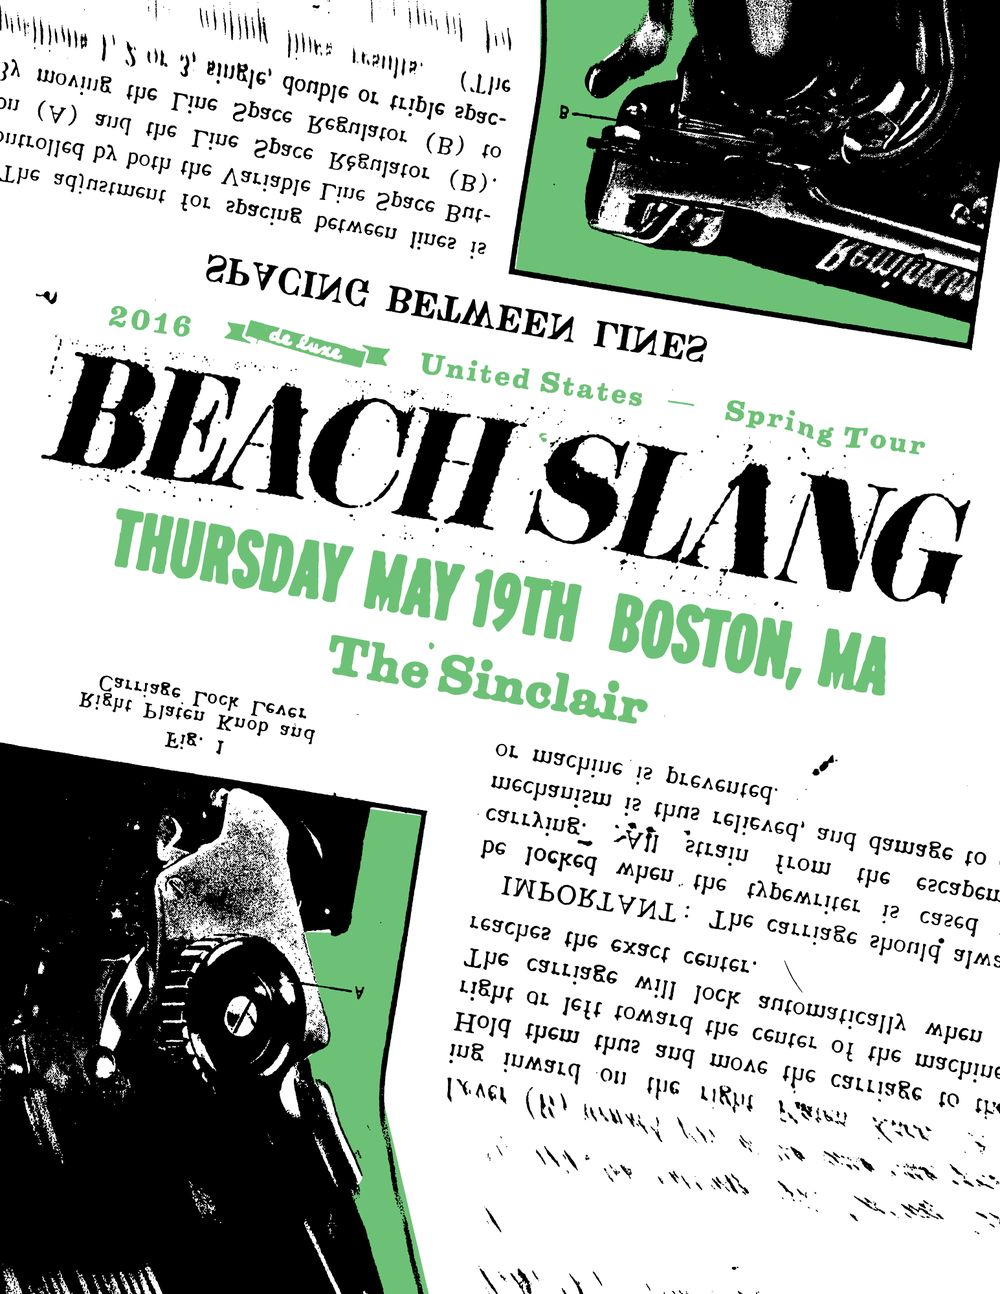 BeachSlang_5-19_Boston_r1.png